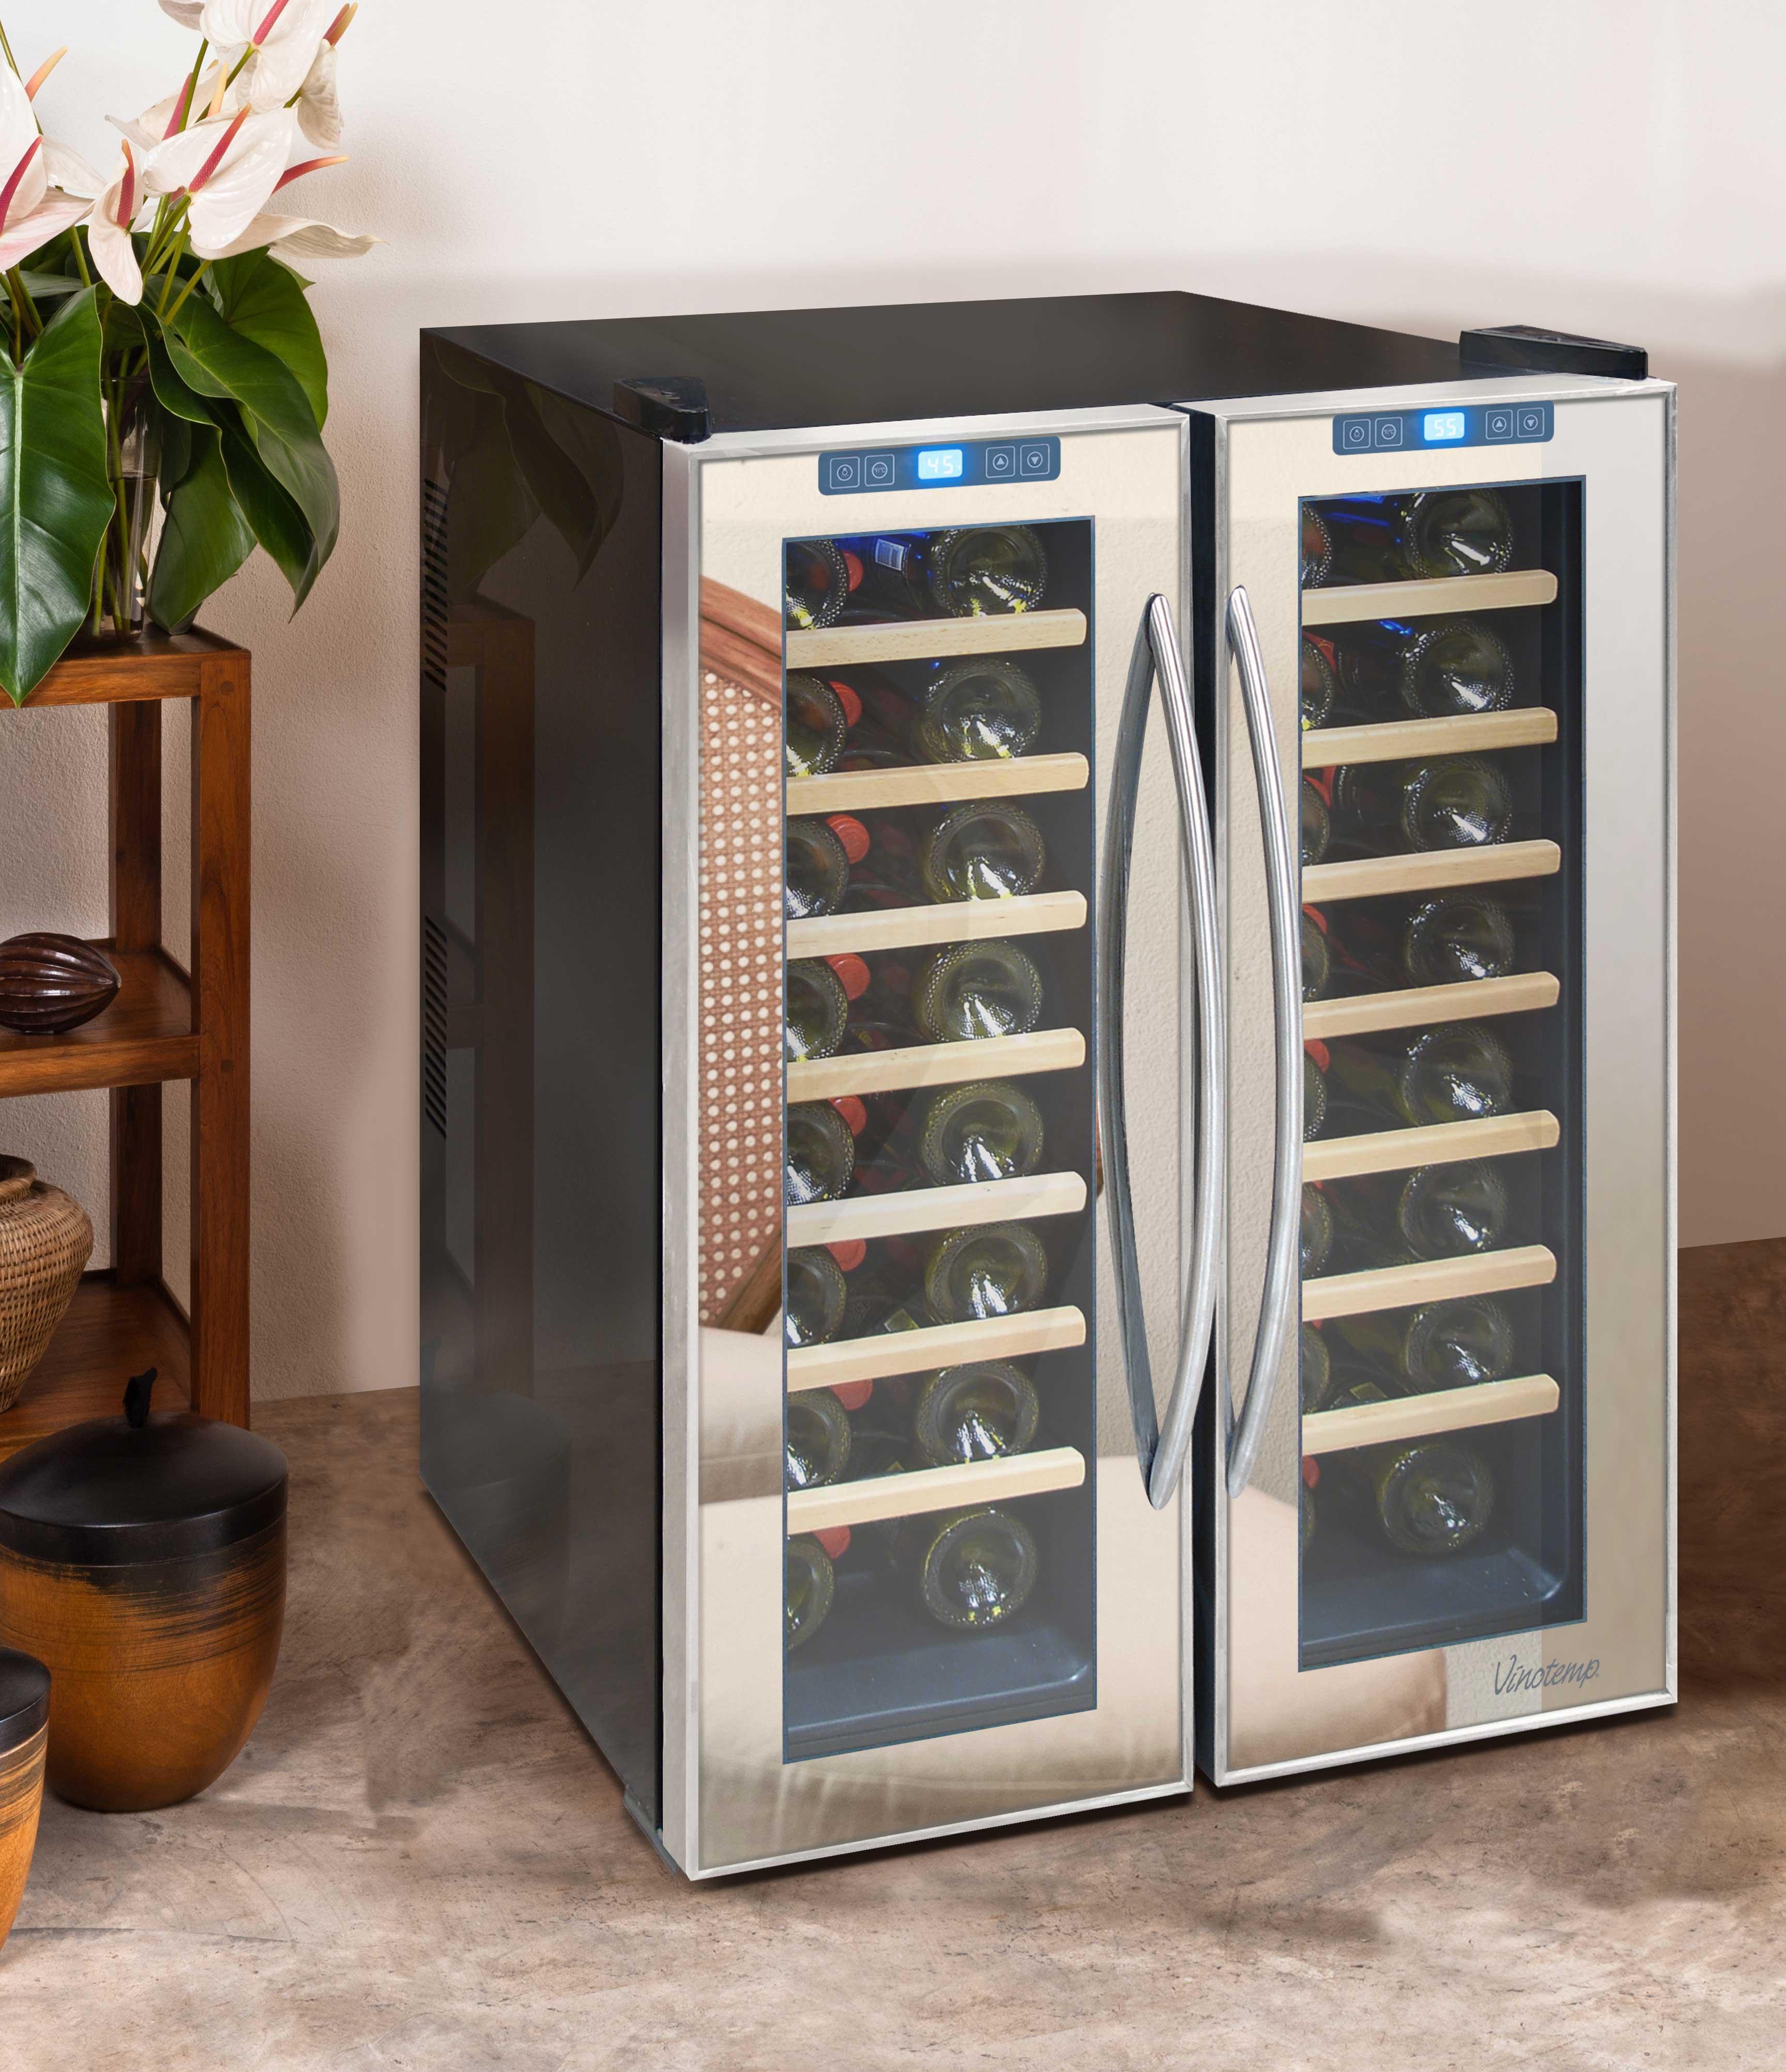 ft prod countertop counter black cu details kitchenaid door product refrigerator depth w interior platinum sears display french printshield outlet jsp finish d